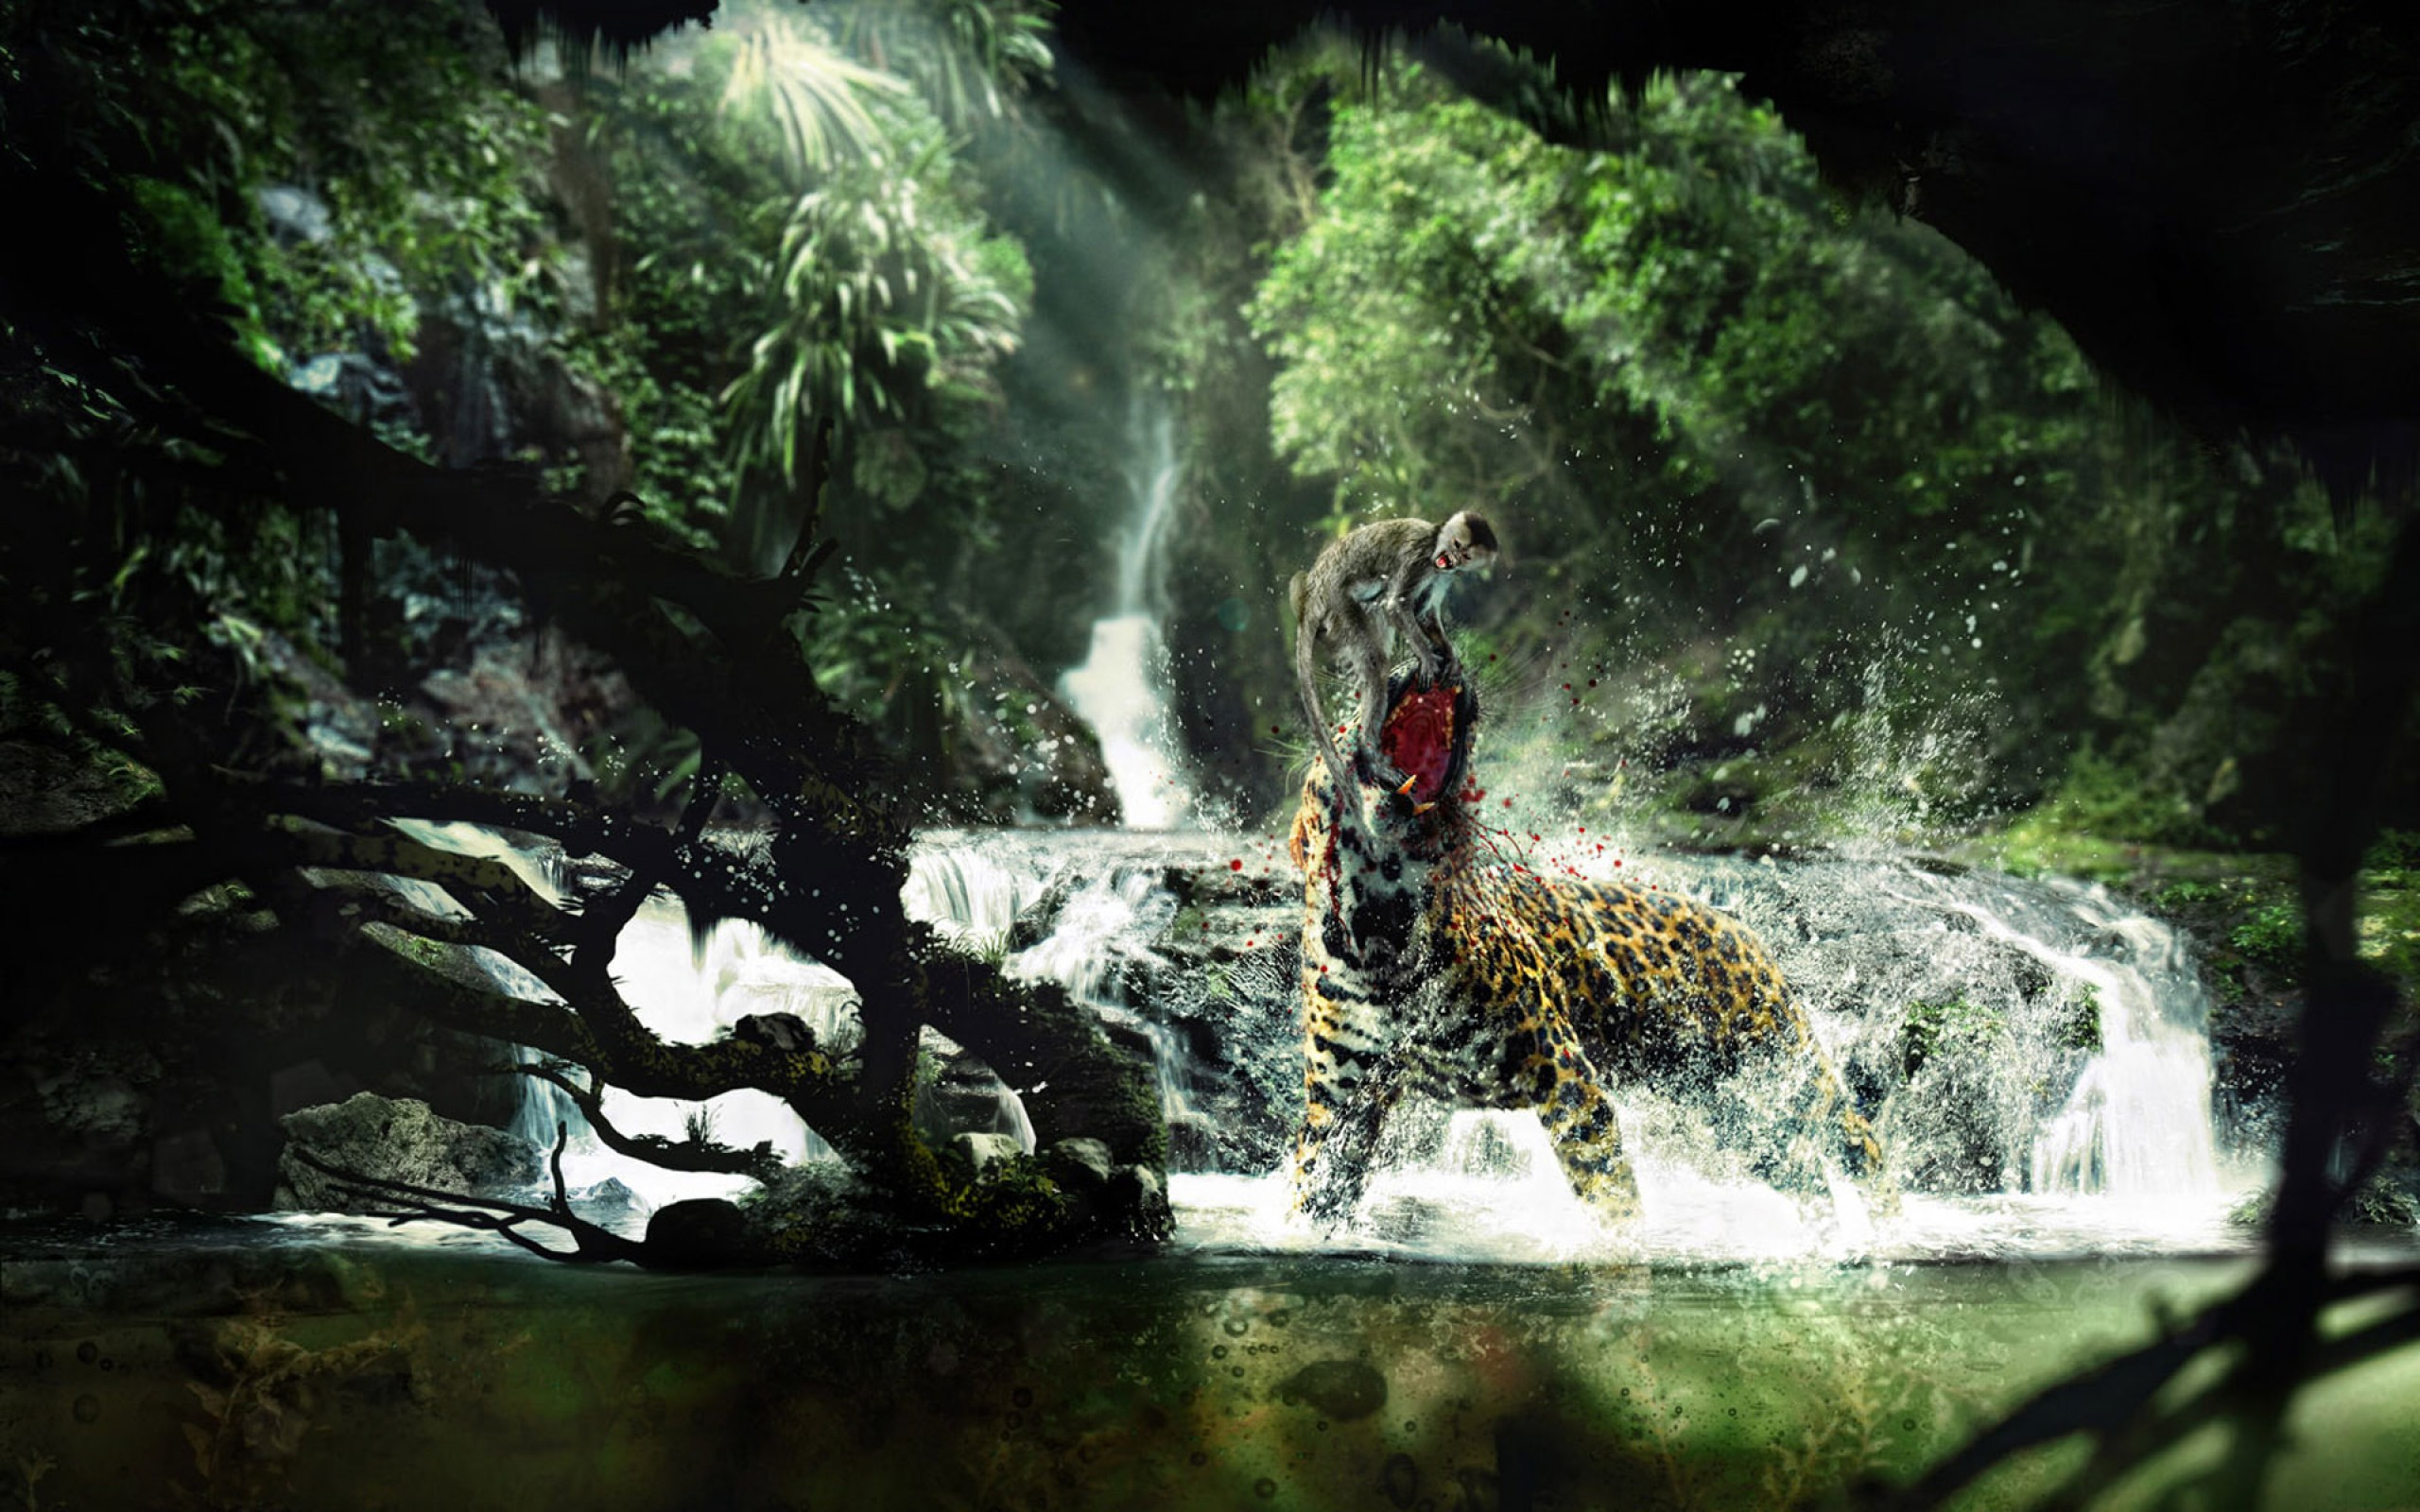 Wild Animals Life Hd Jootix 749259 Wallpaper